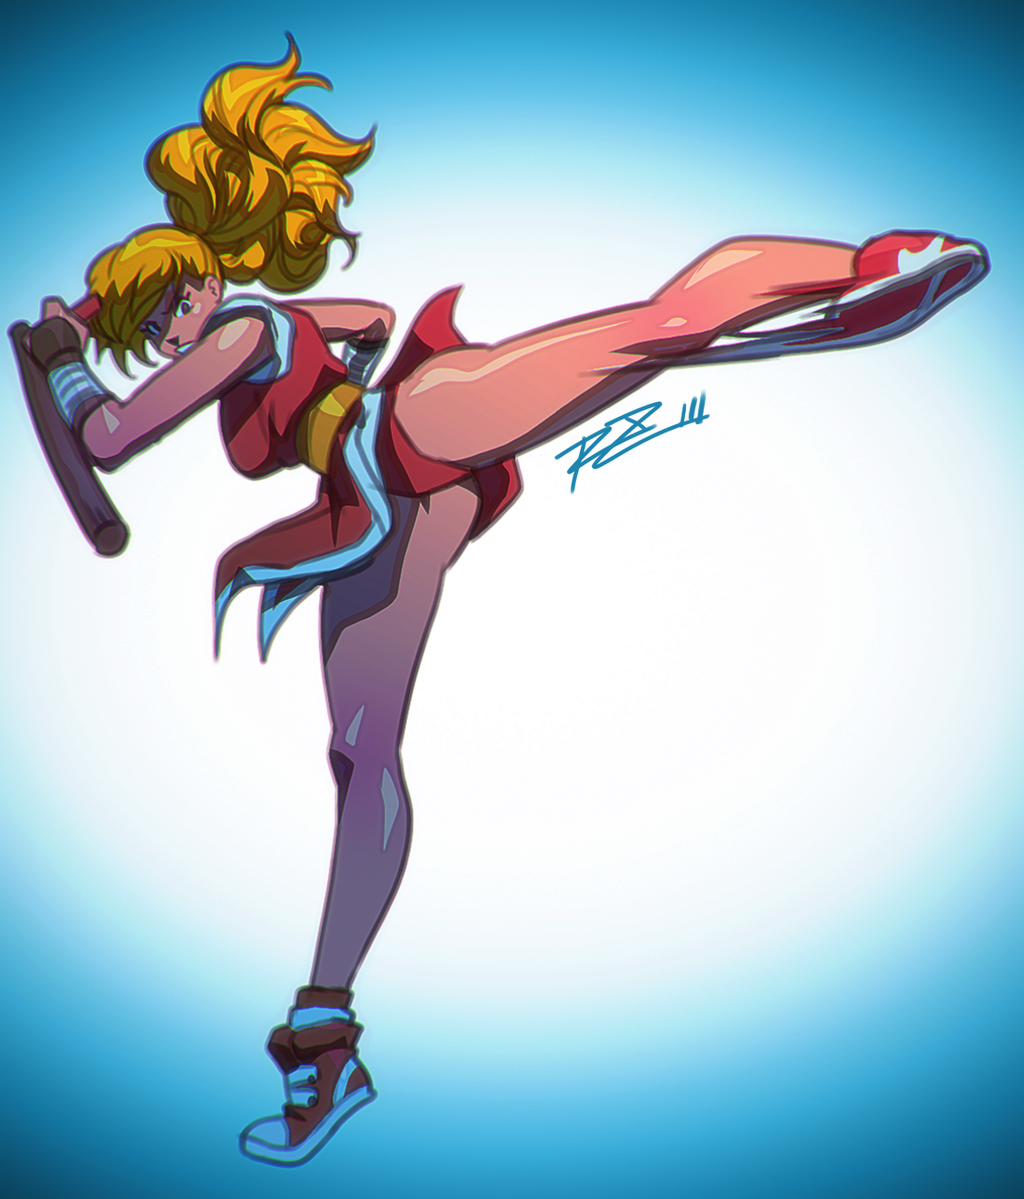 1girl blonde_hair breasts final_fight genryuusai_maki kicking long_hair motion_blur ninja ponytail robert_porter shoes sneakers solo standing_on_one_leg tonfa upskirt weapon